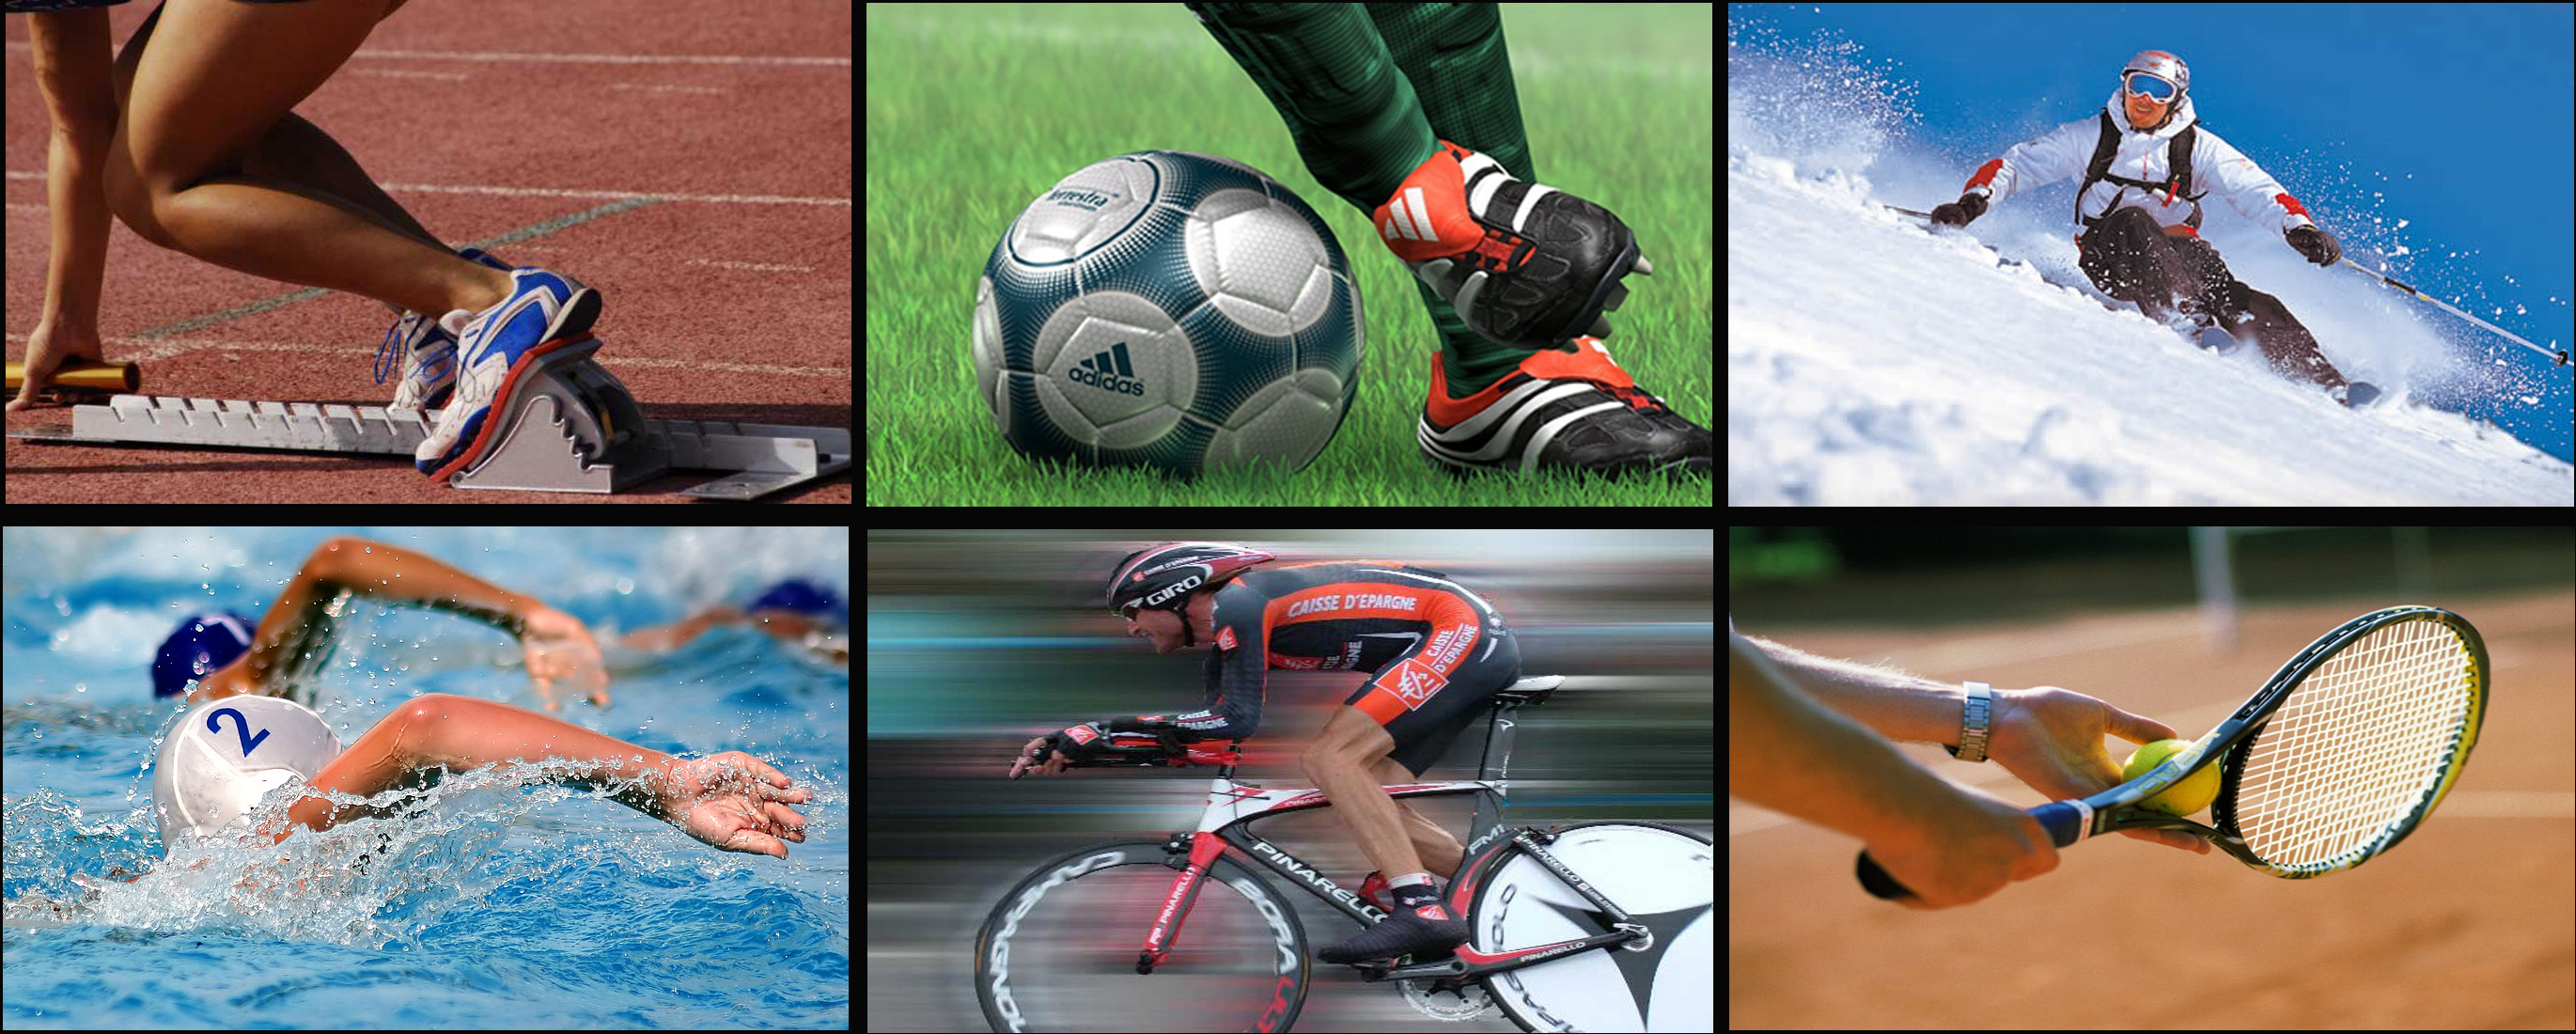 Sport | Euro Palace Casino Blog - Part 2